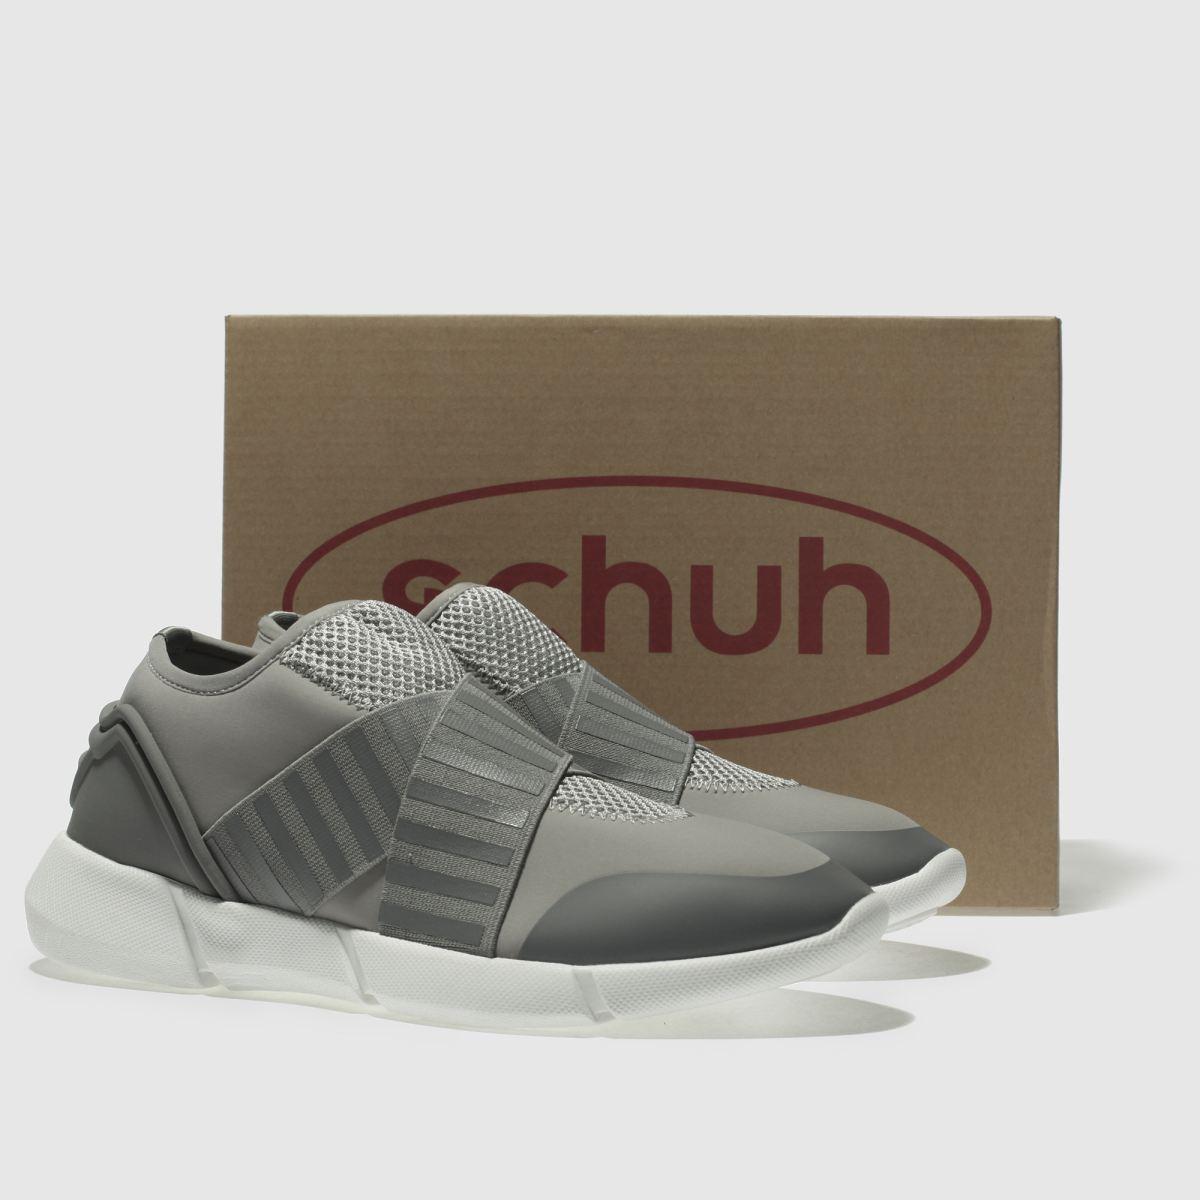 Damen Grau schuh Trouble Qualität Sneaker   schuh Gute Qualität Trouble beliebte Schuhe 613cb0